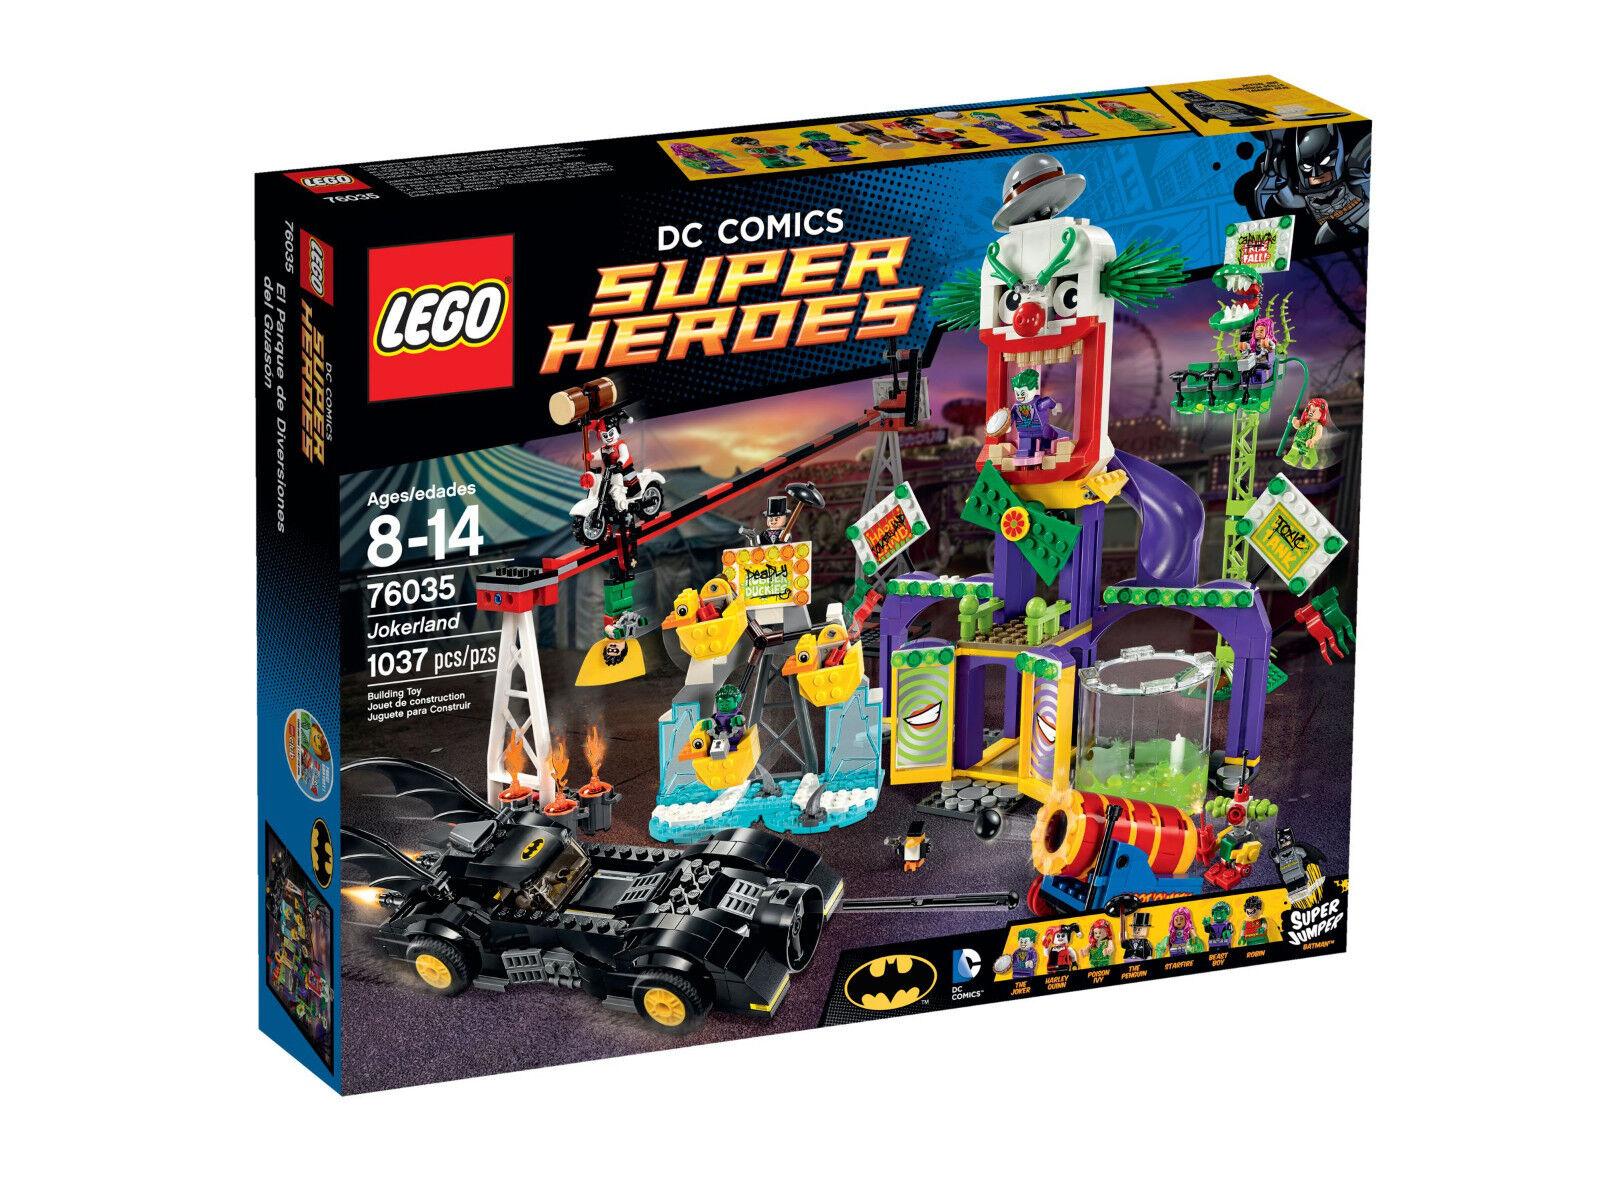 LEGO Super Heroes 76035 - Joker Land   Jokerland - Batman Harley Poison Ivy DC